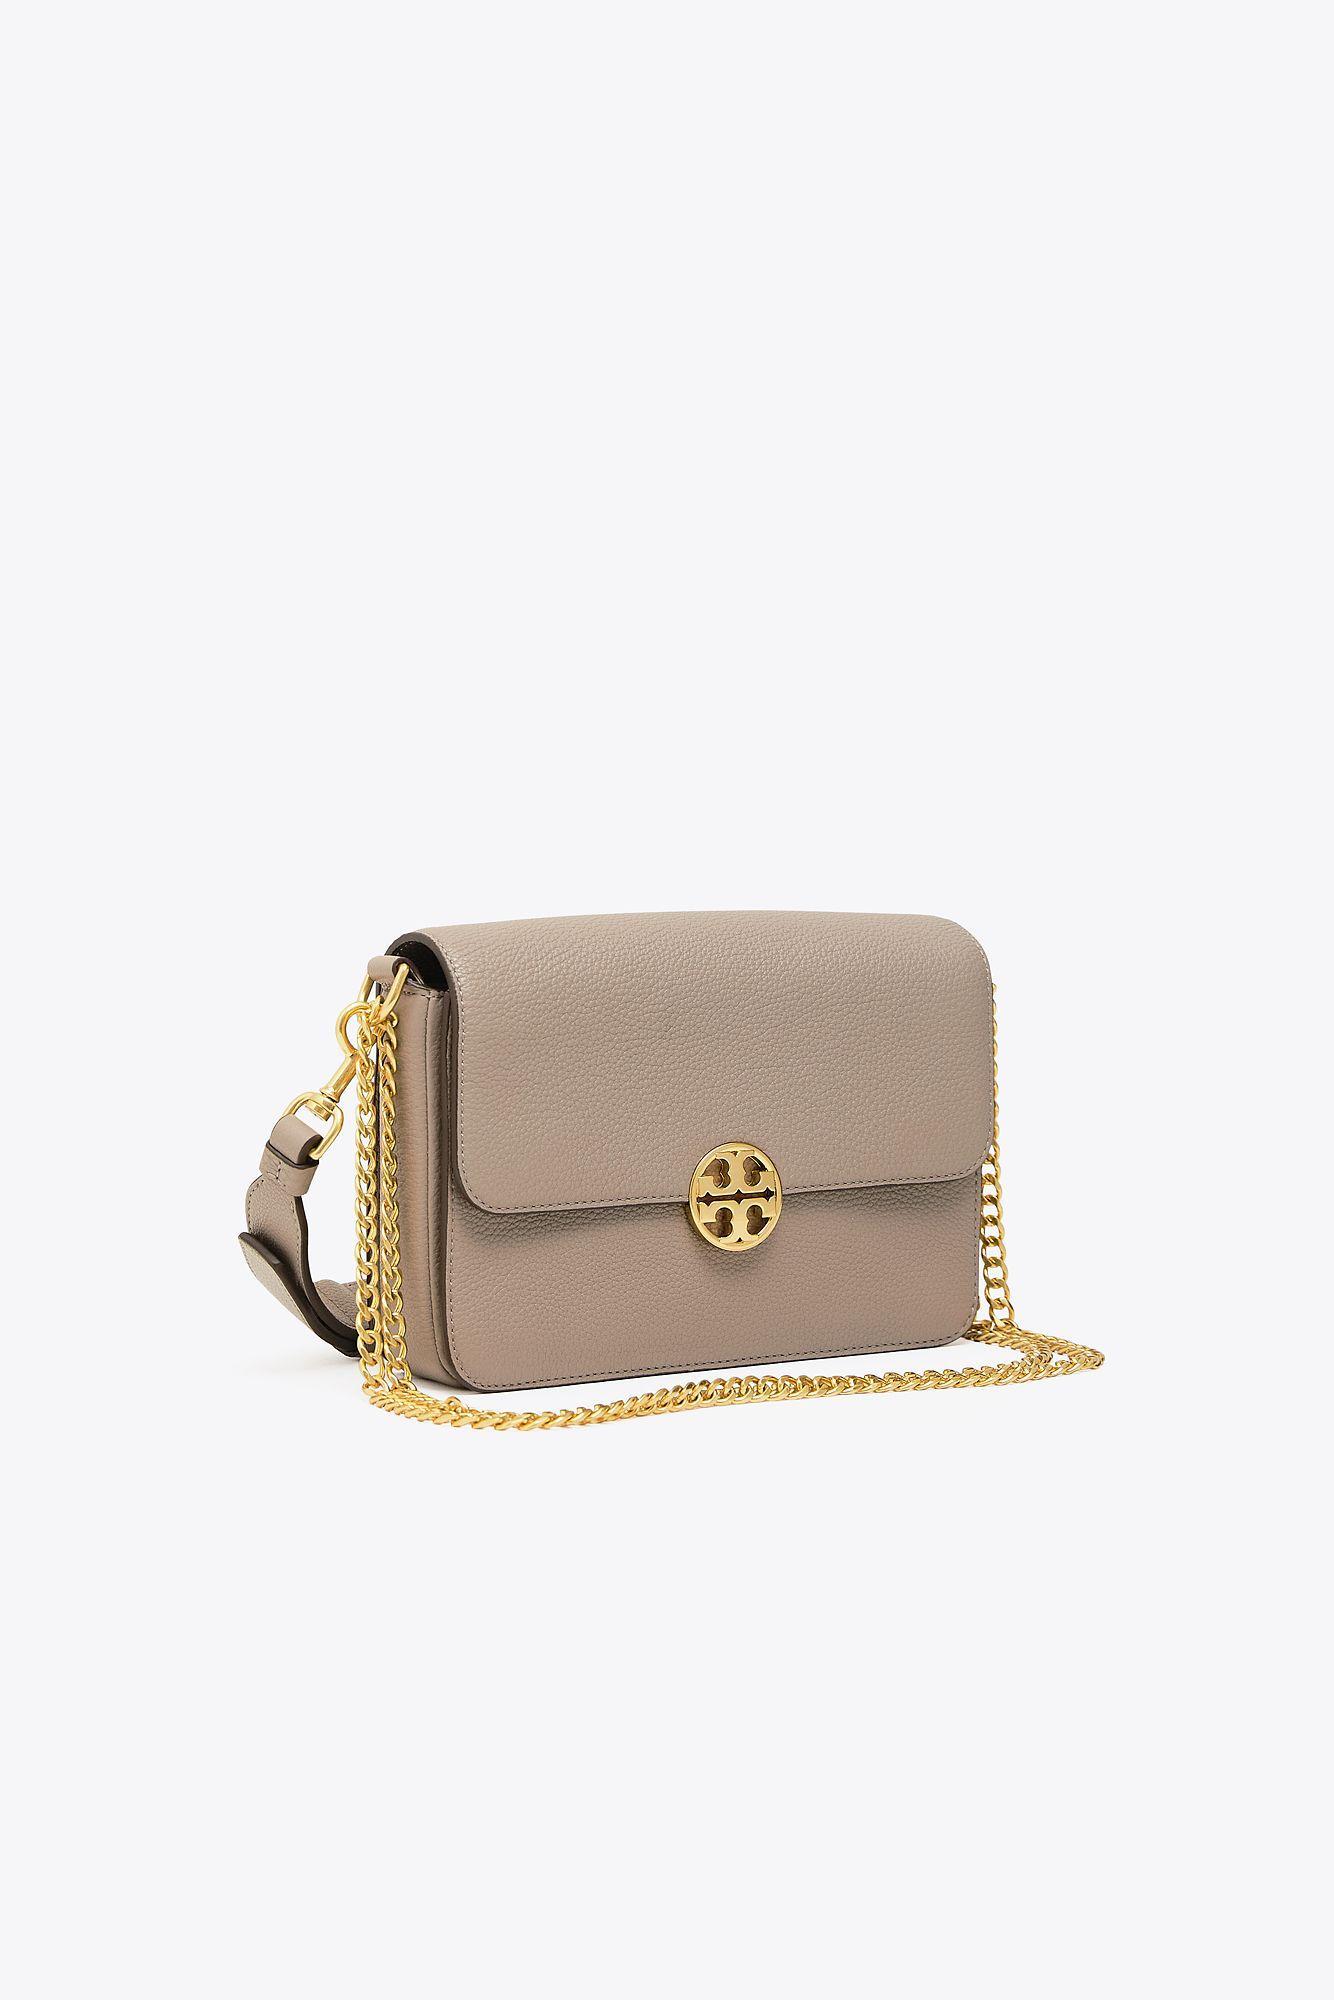 9b6953f379ad Lyst - Tory Burch Chelsea Convertible Shoulder Bag